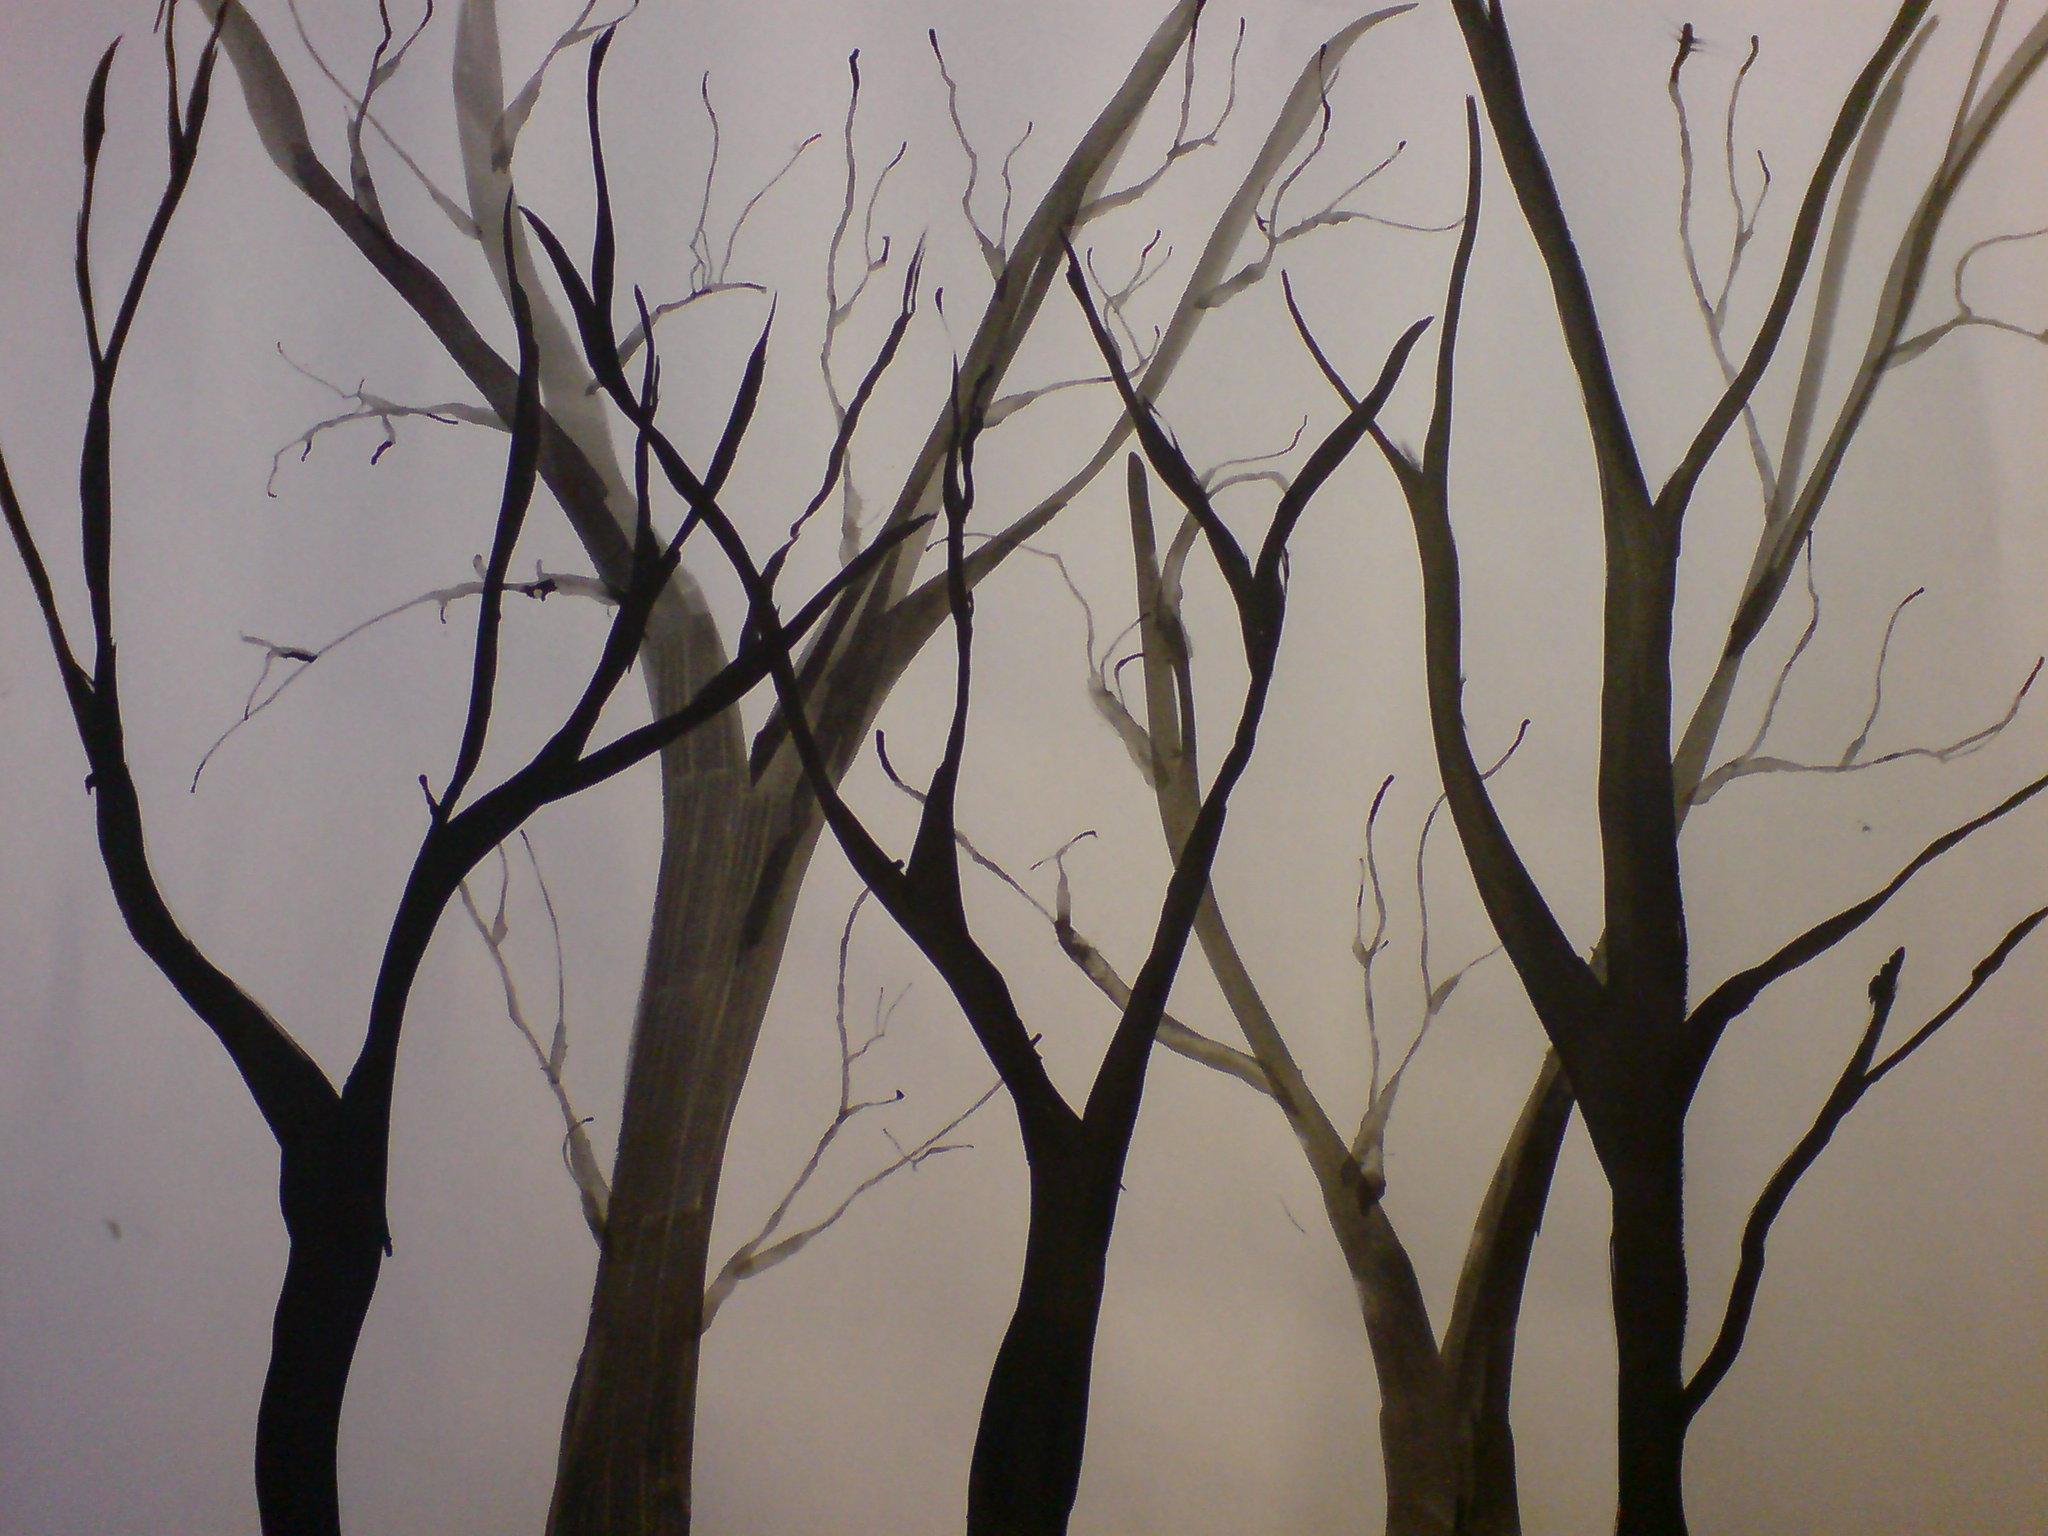 2048x1536 Ink Tree Drawings 3 By Kiriaki